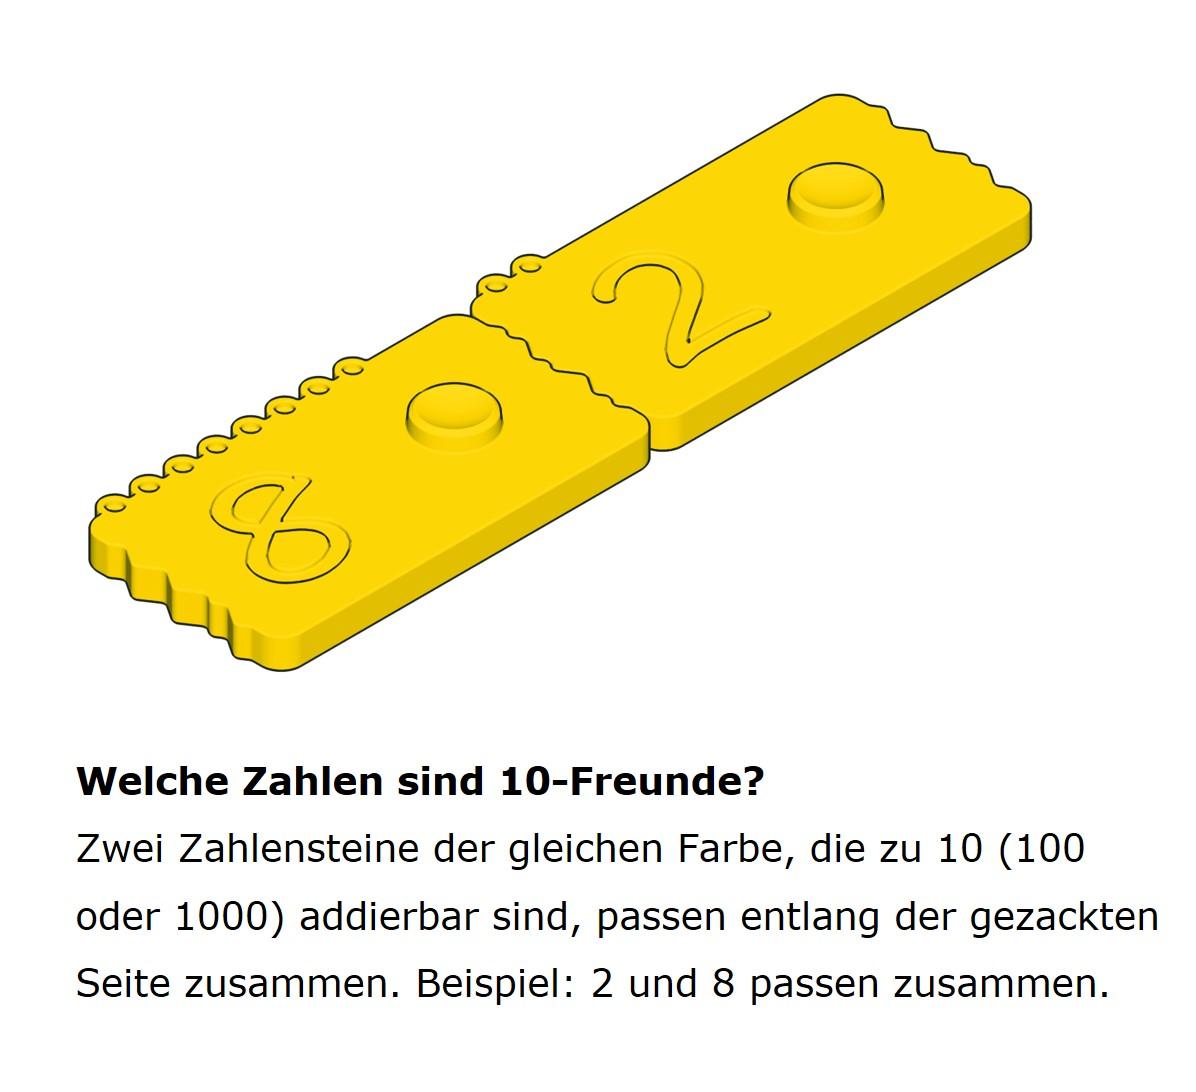 10-Freunde_newmero_bricks.jpg